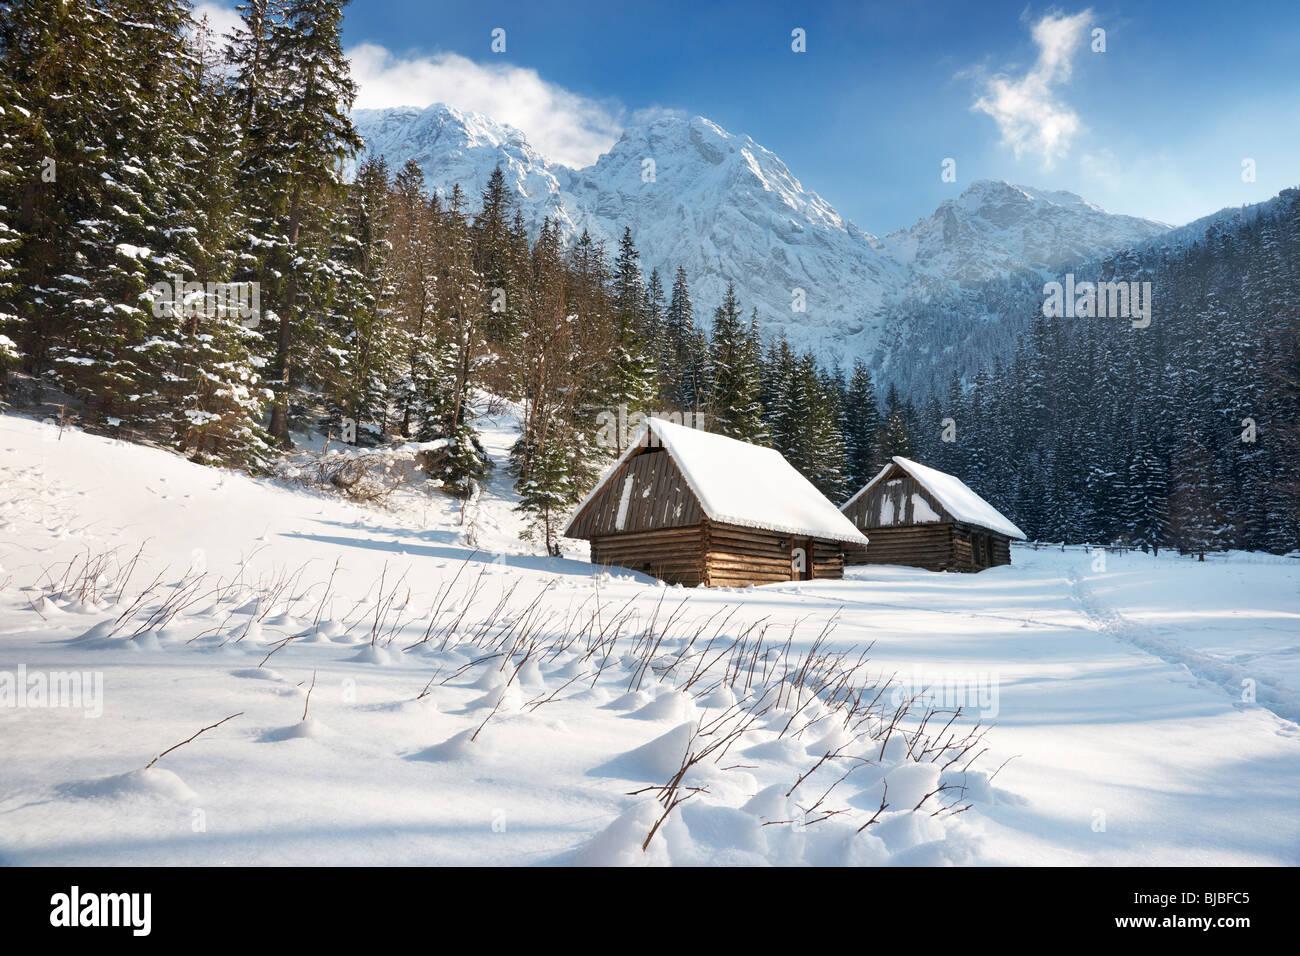 Winter snow mountain landscape with blue sky Tatra Mountains